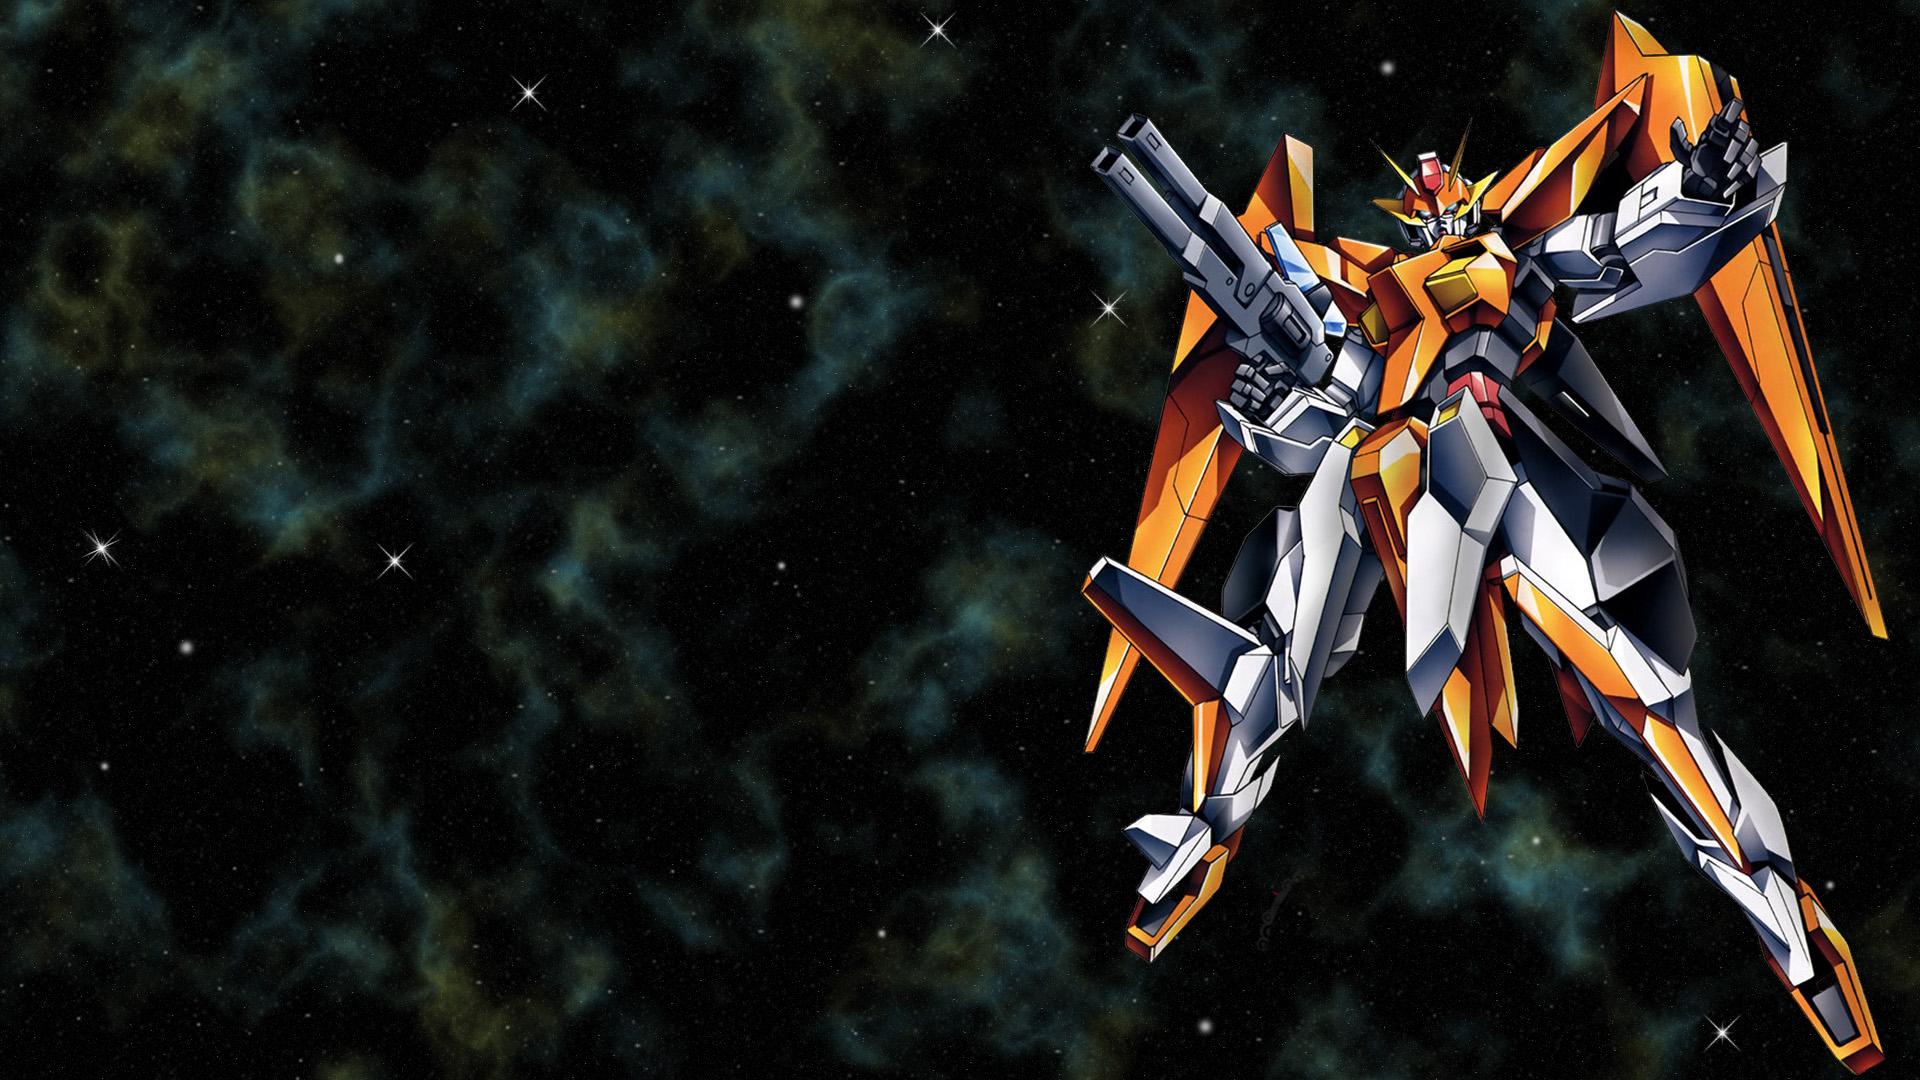 GN-007 Arios Gundam - Mobile Suit Gundam 00 - HD Wallpaper #973032 - Zerochan Anime Image Board